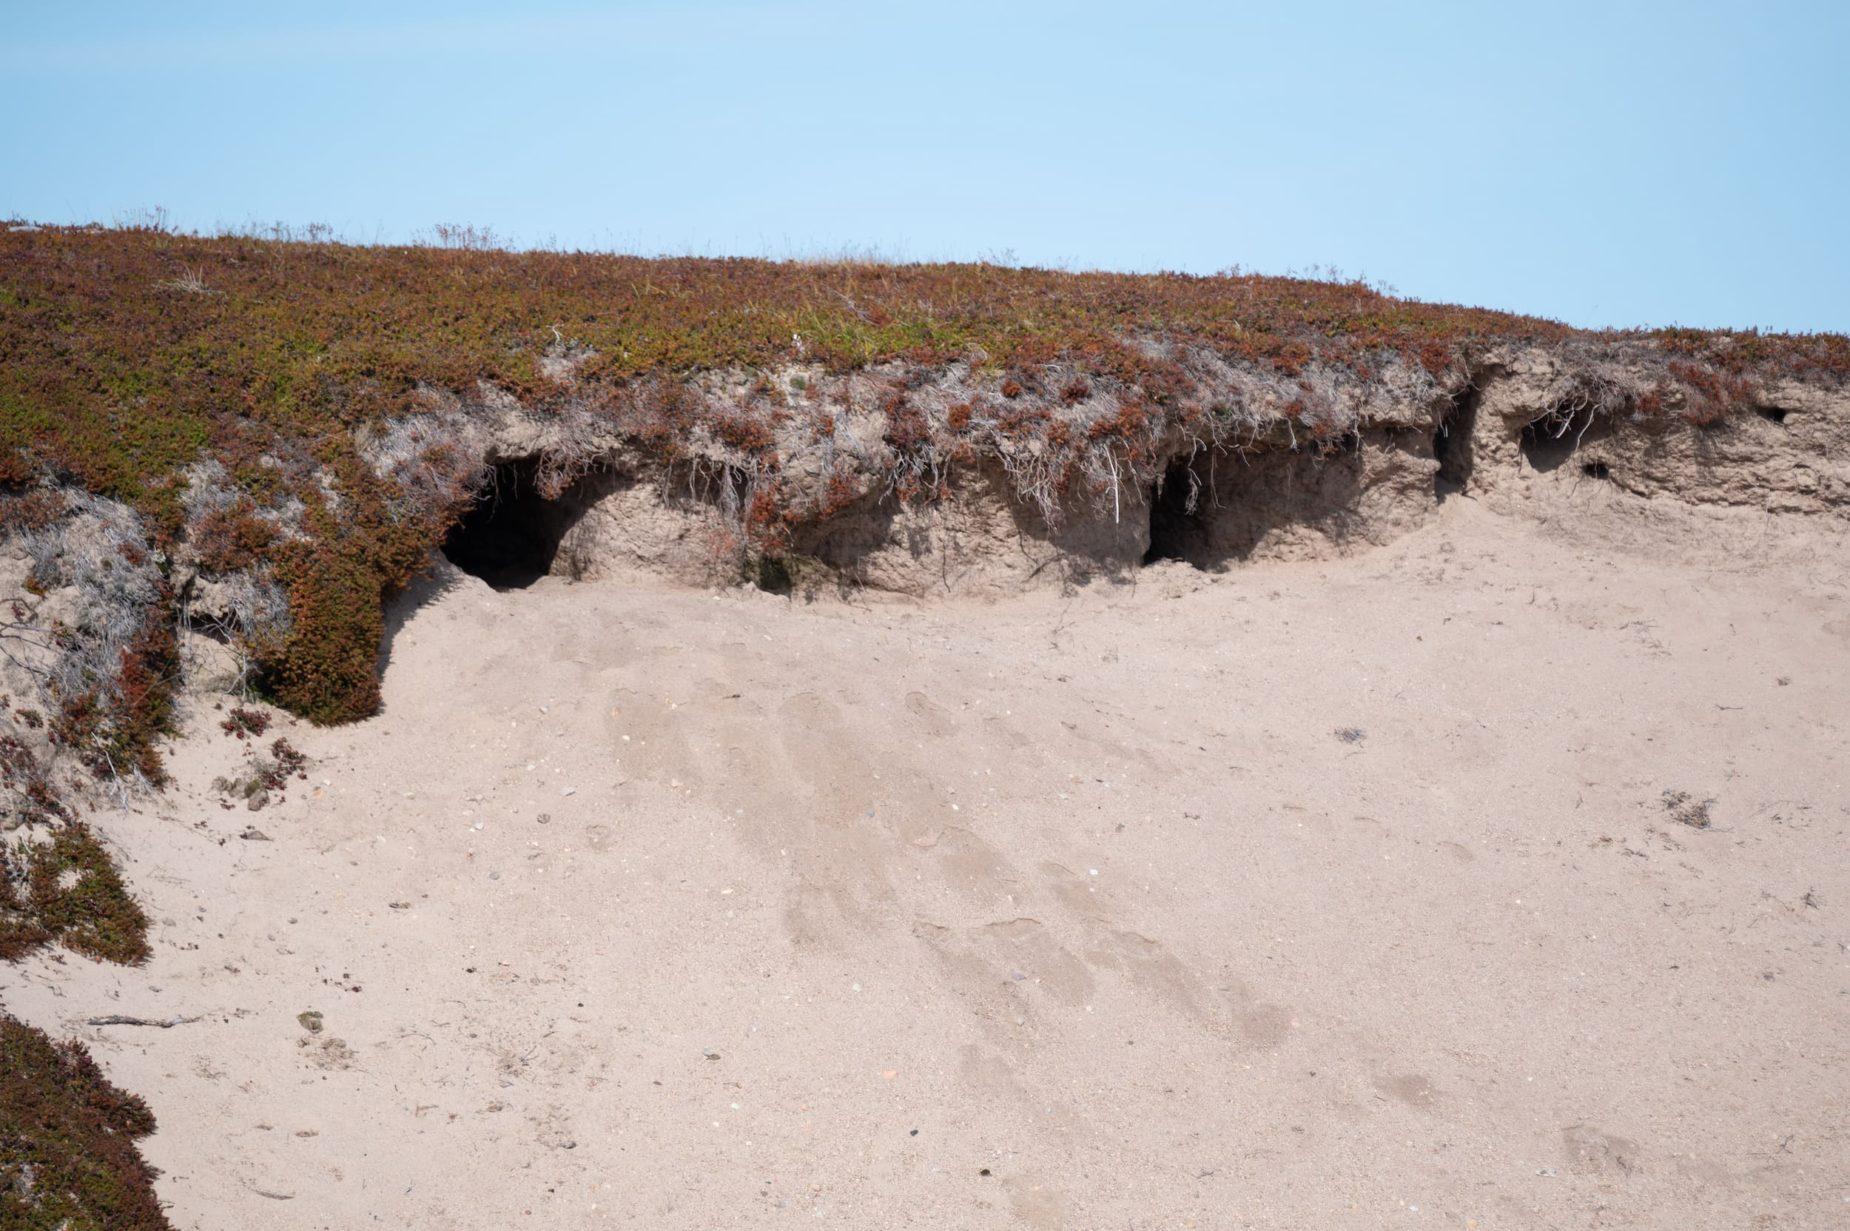 landscape image of a group of wolf dens